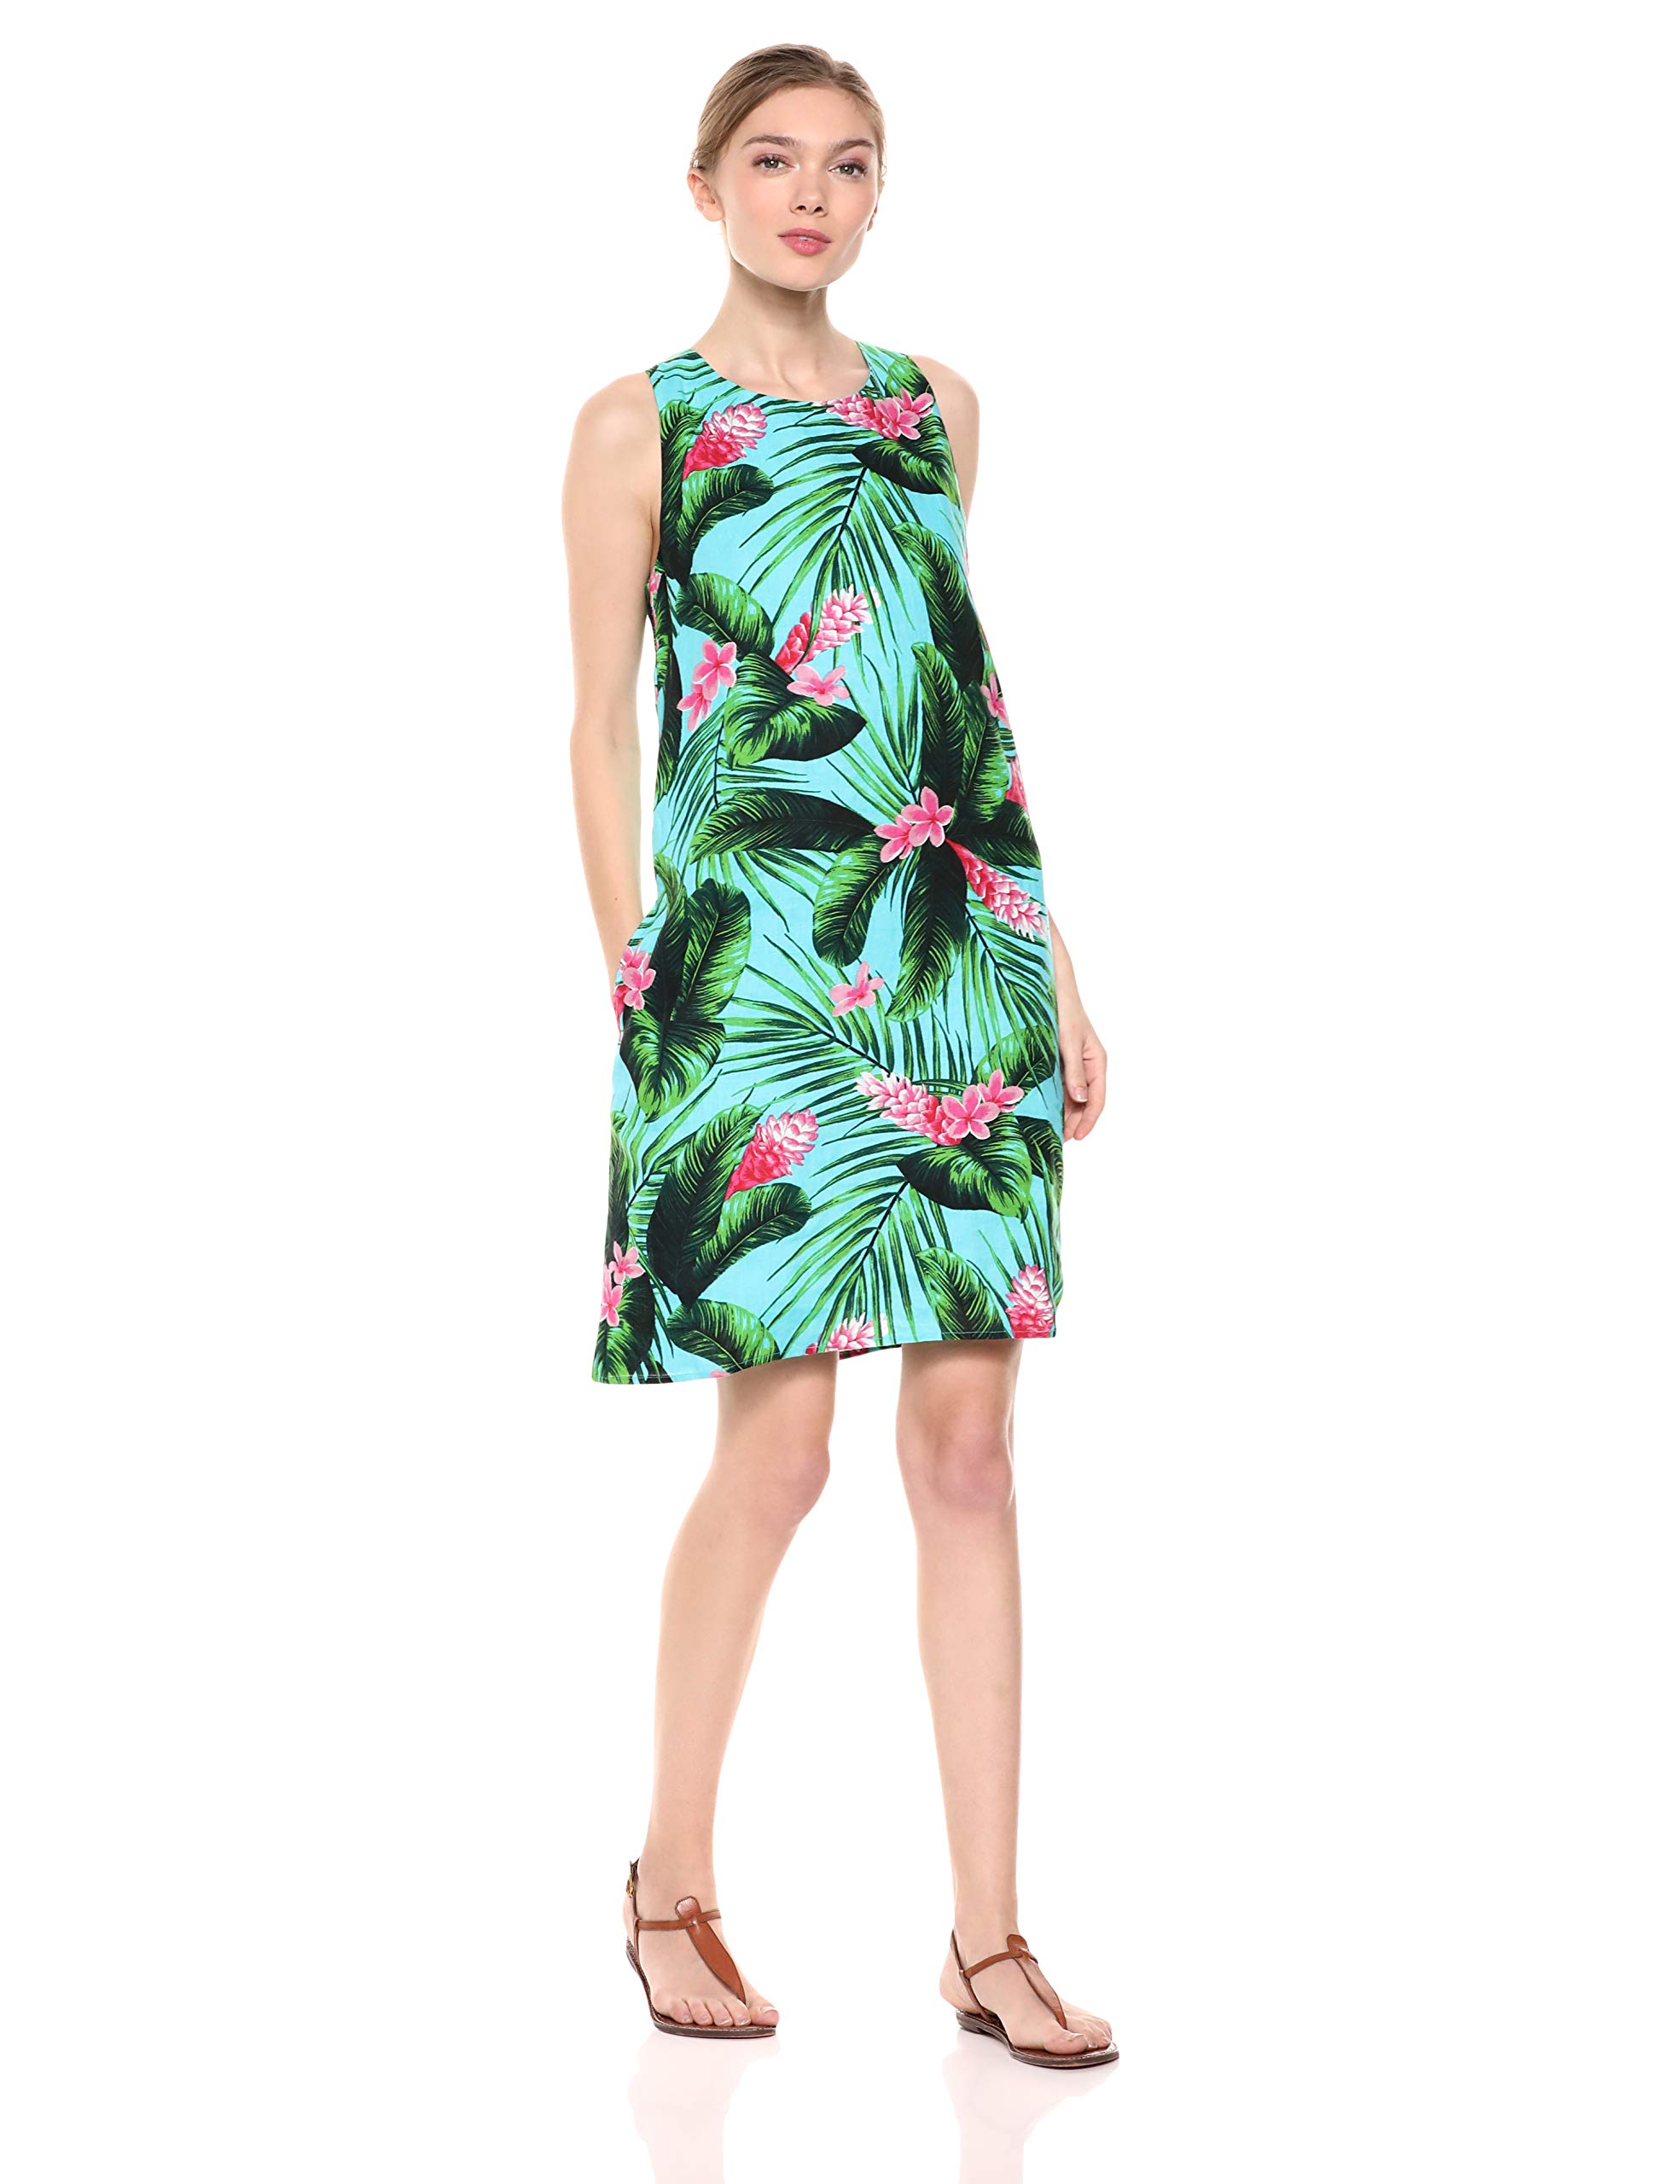 LeuXl Print Palms Ginger Hawaiian pink Shift TropicalUs DressAqua 100Linen 28 vmPyN0O8nw